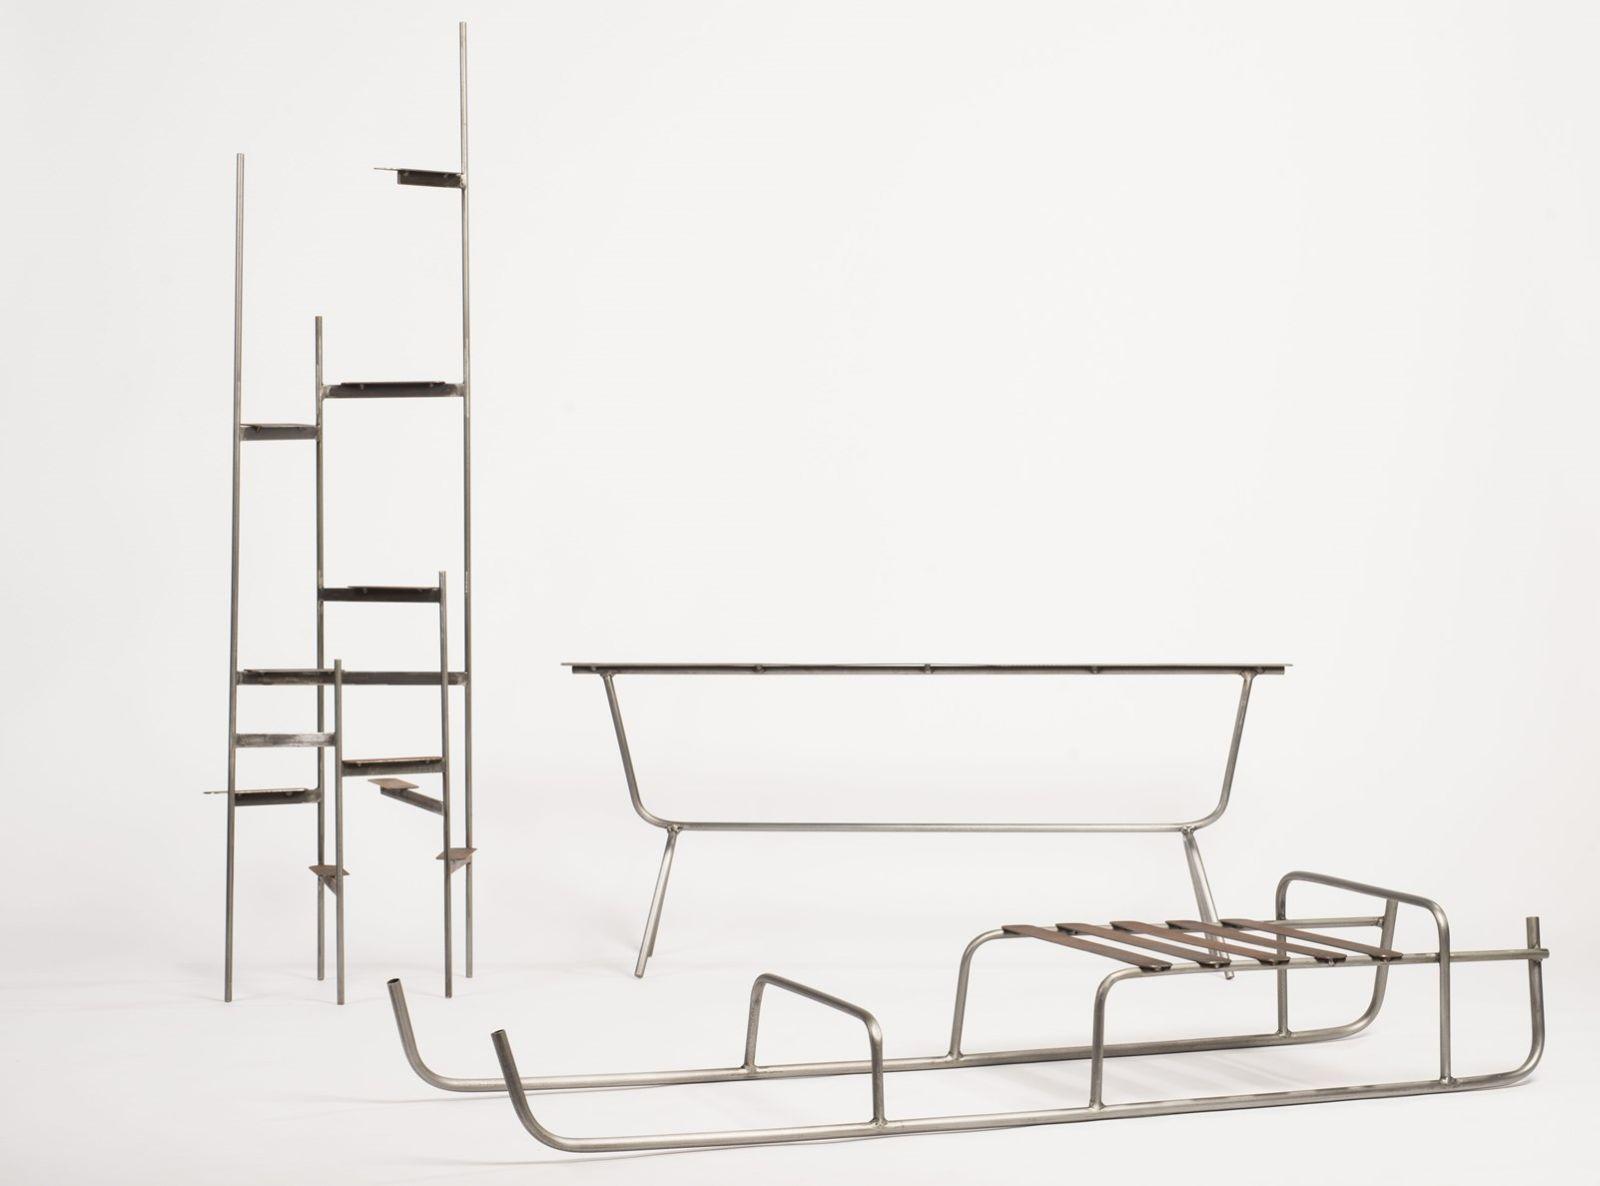 Neil Nenner's shelves, bench and sled. Photo by Shachar Fleischmann